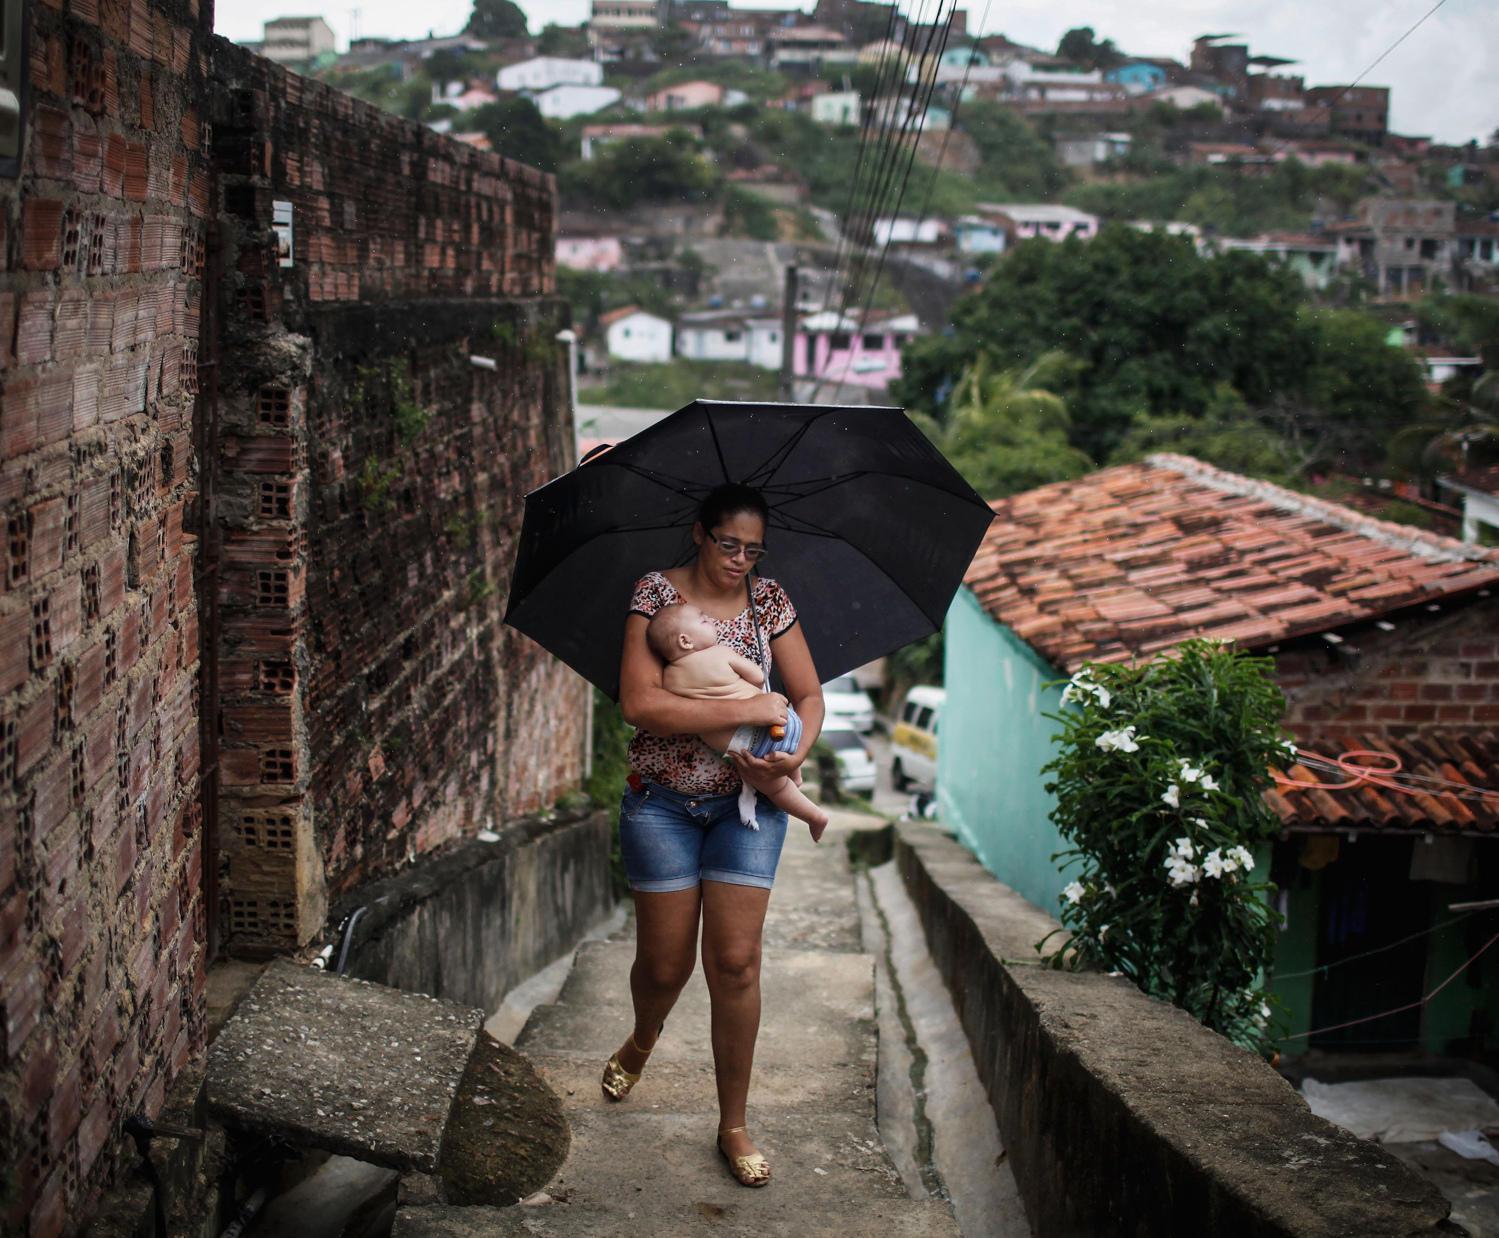 CDC team kicks off Zika study in Brazil focused on Zika